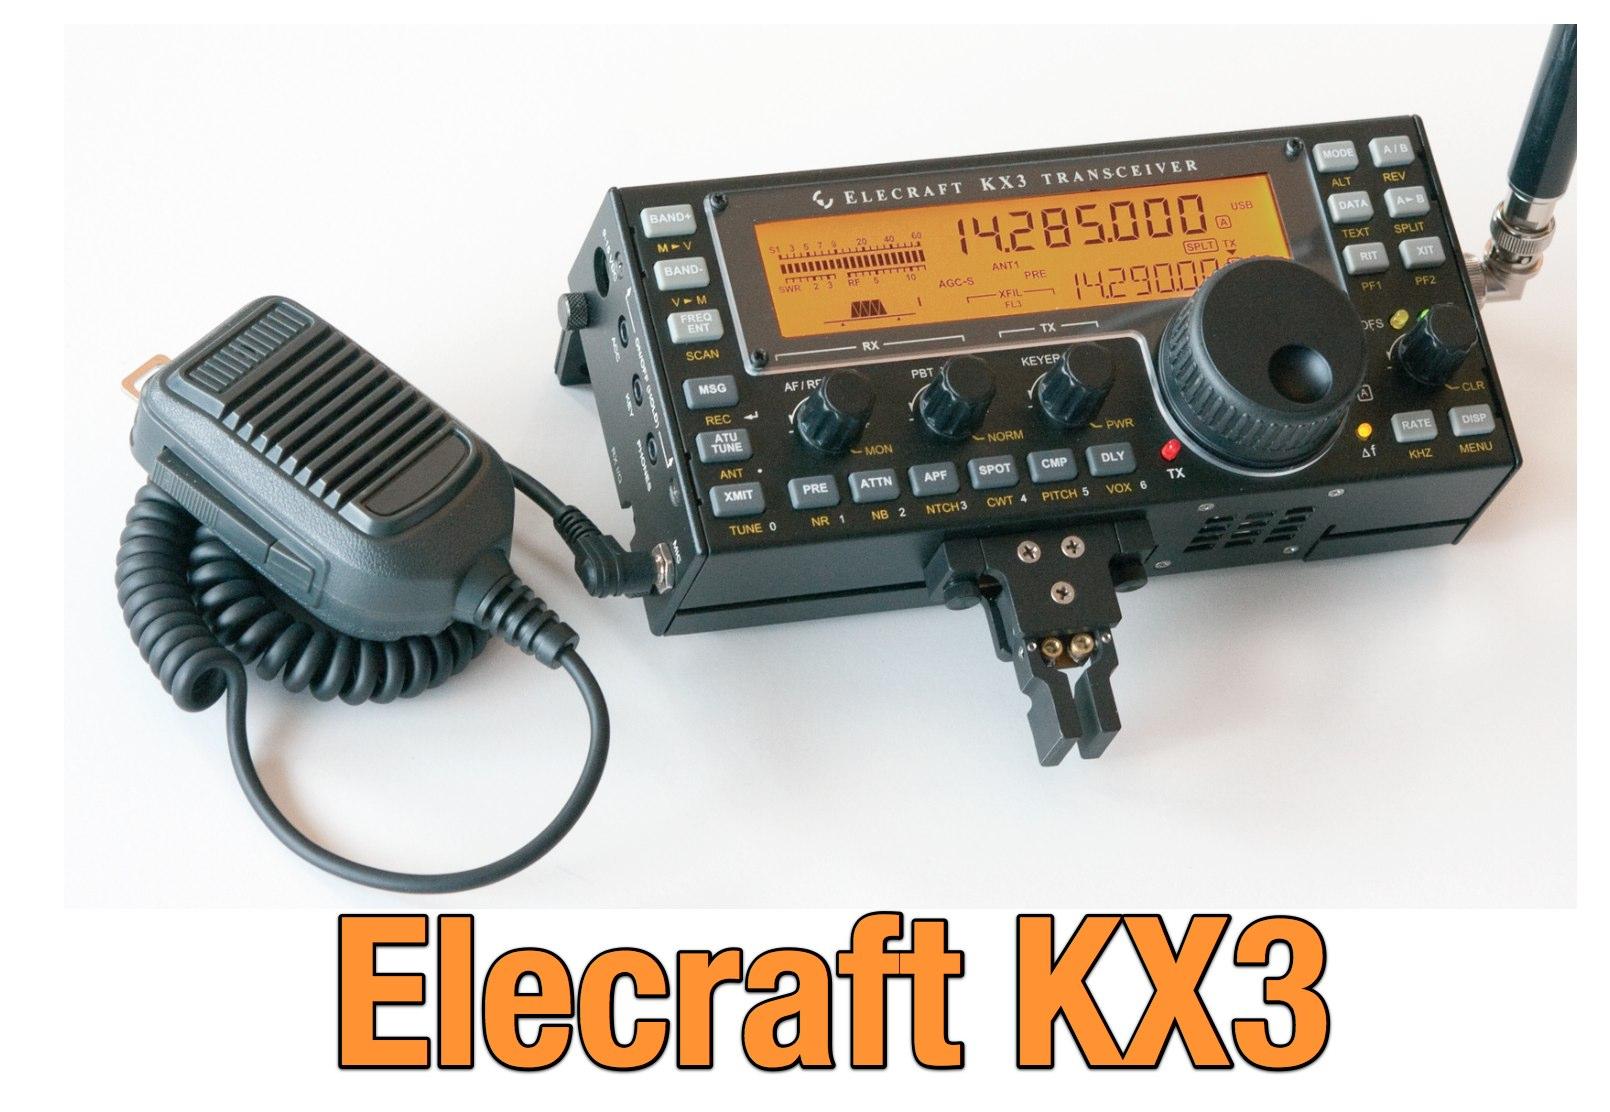 Elecraft KX3